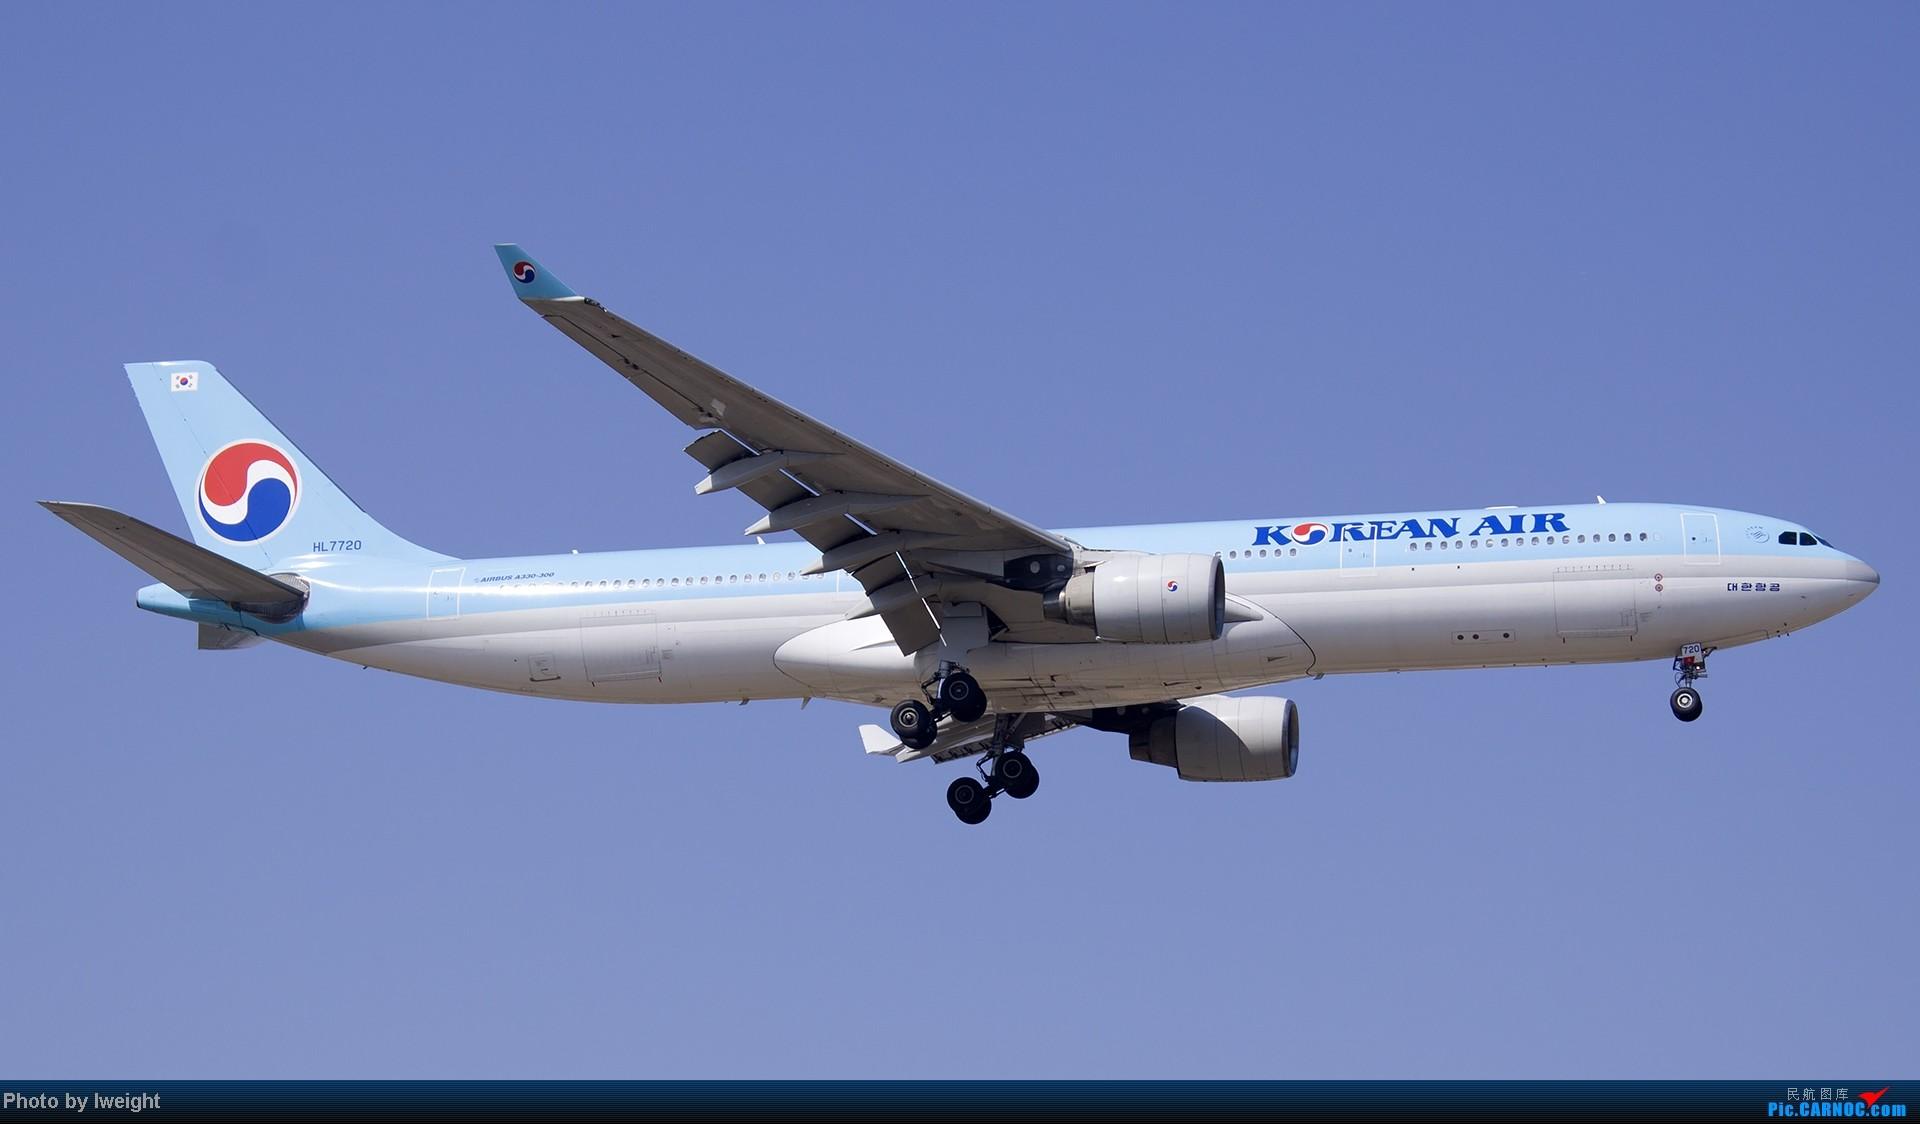 Re:[原创]北京难得的好天气,收获多种机型和彩绘,遗憾的是再次错过卡航巴塞罗那彩绘 AIRBUS A330-300 HL7720 中国北京首都机场